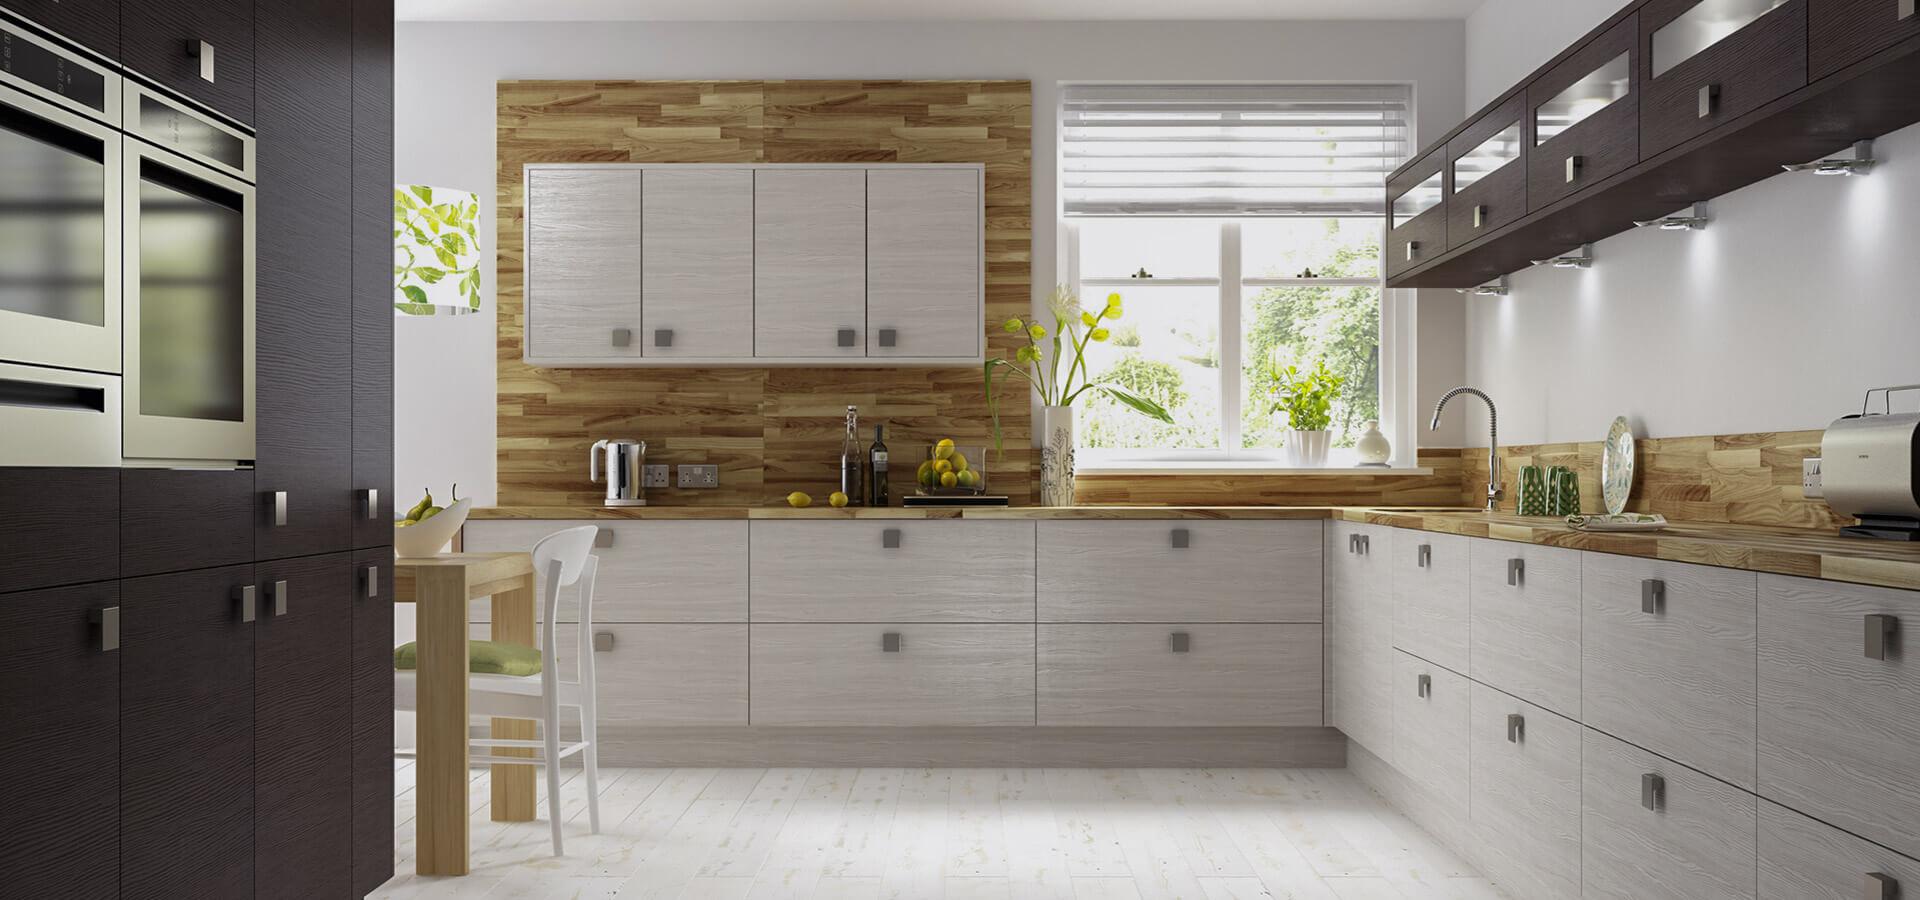 home_furniture2_projectdetails2